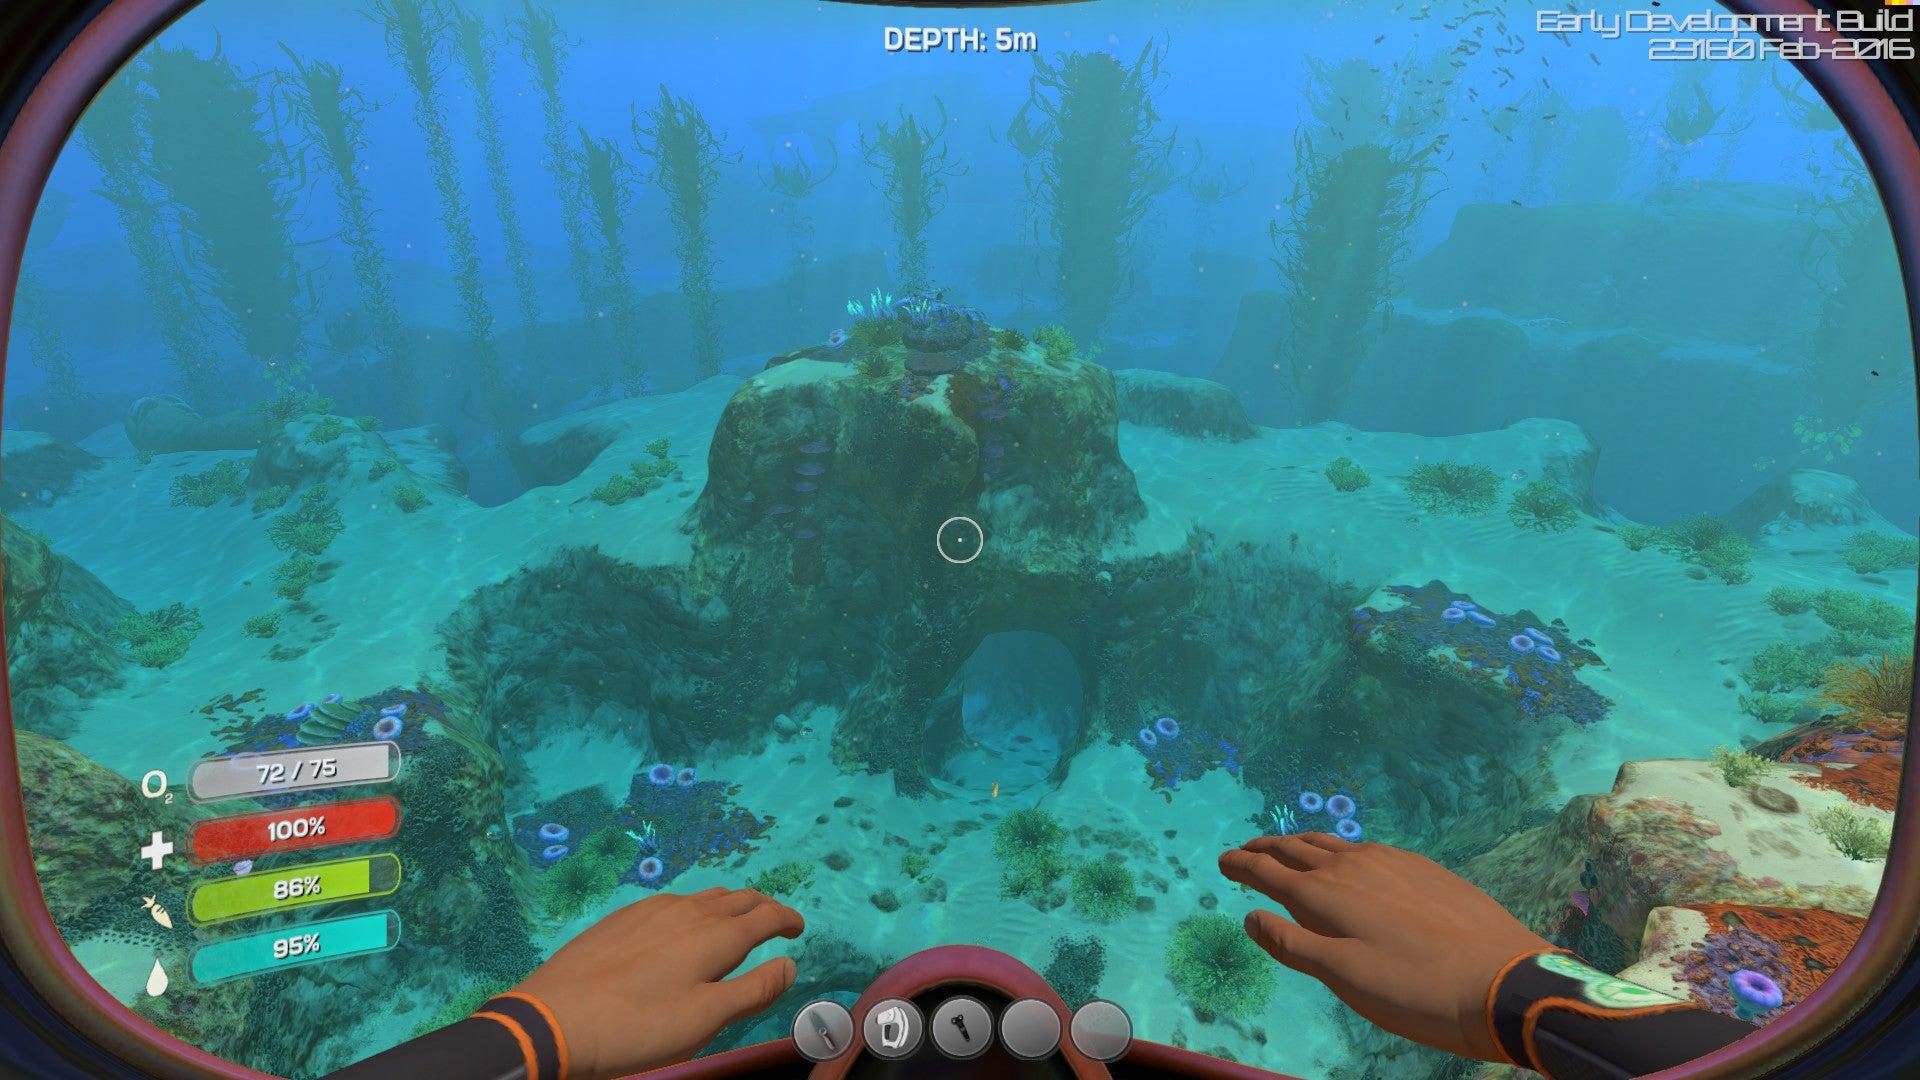 Three Promising Early Access Games: Killing Floor 2, Epsilon, Subnautica